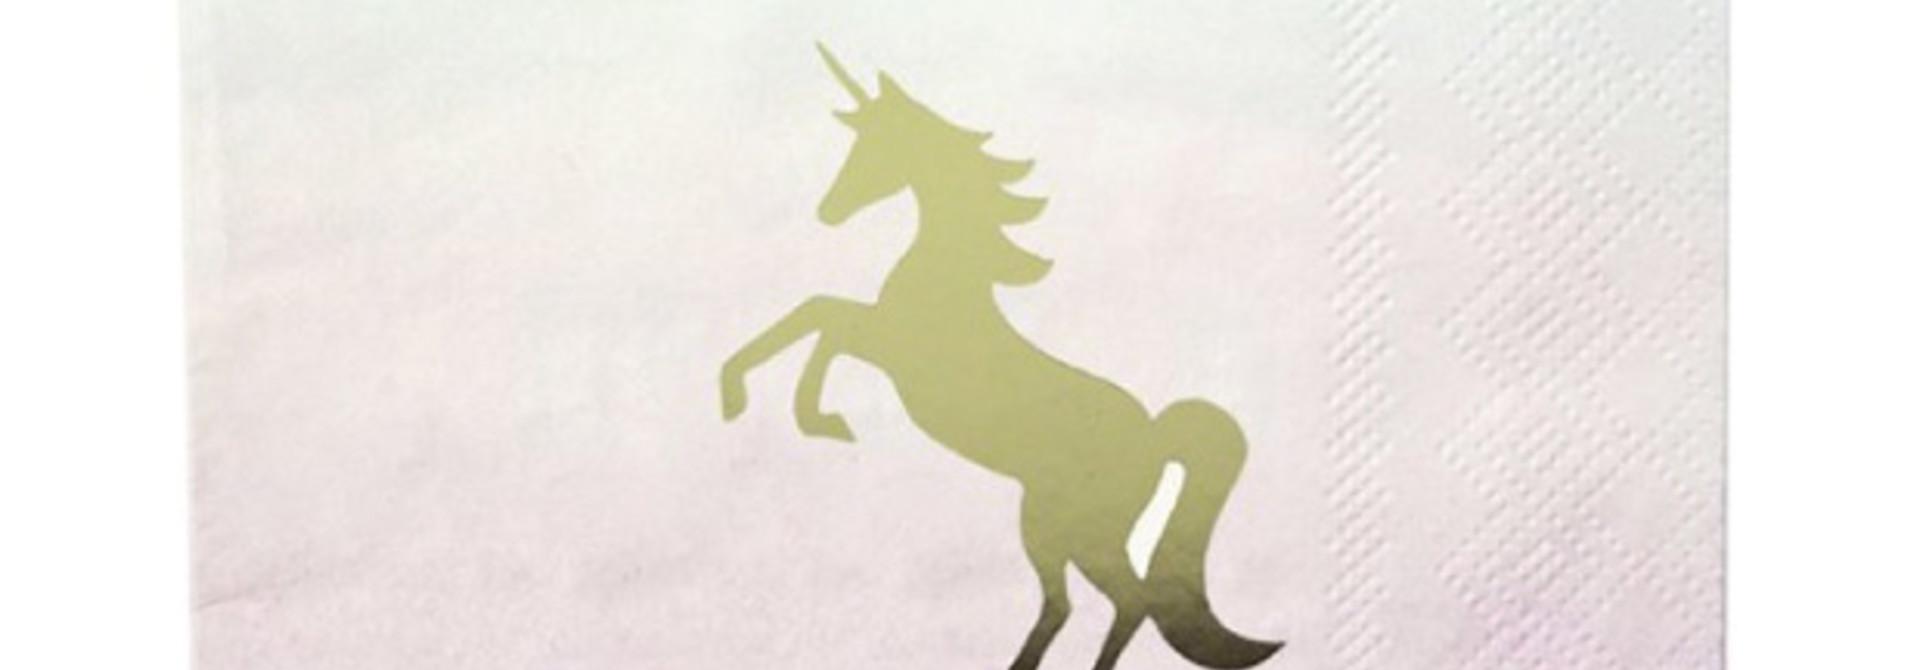 We ♥ unicorns servetten (16 st) - Talking Tables